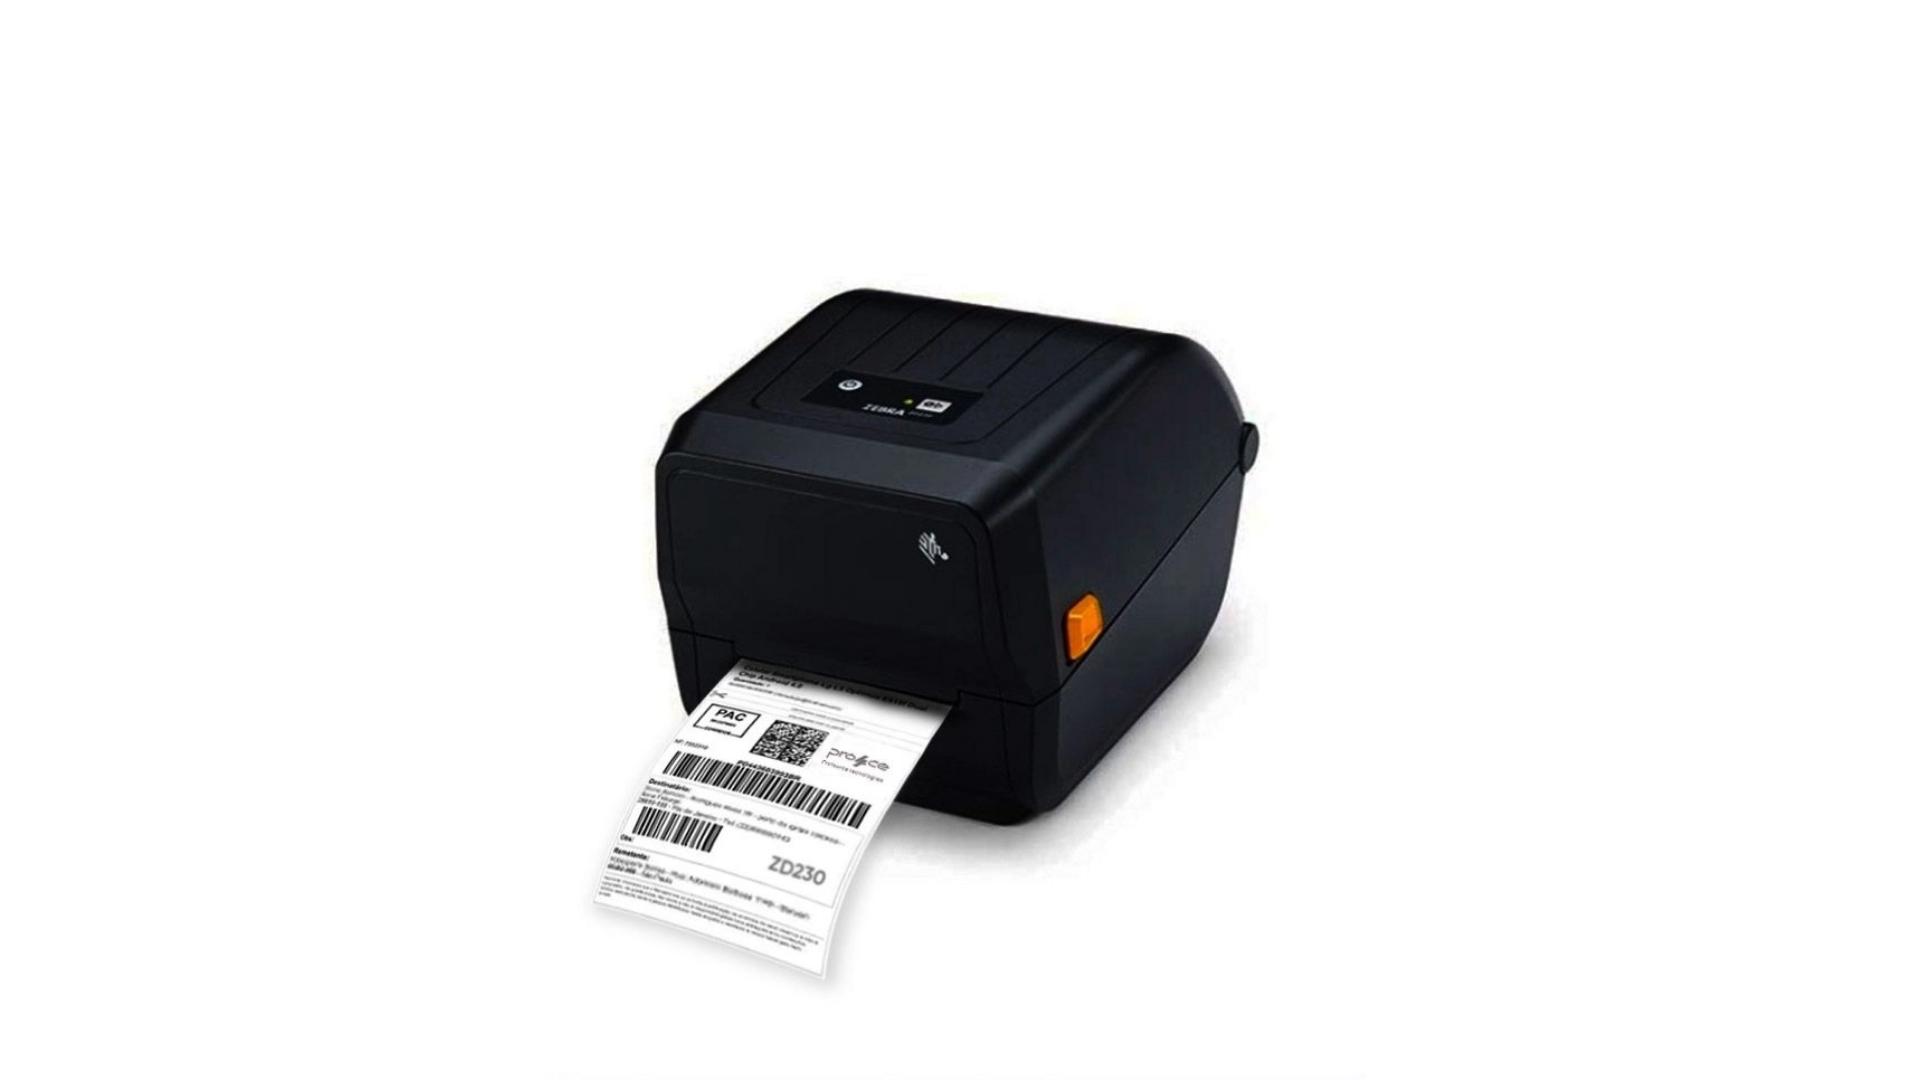 Impressora Zebra ZD230 imprimindo etiqueta.